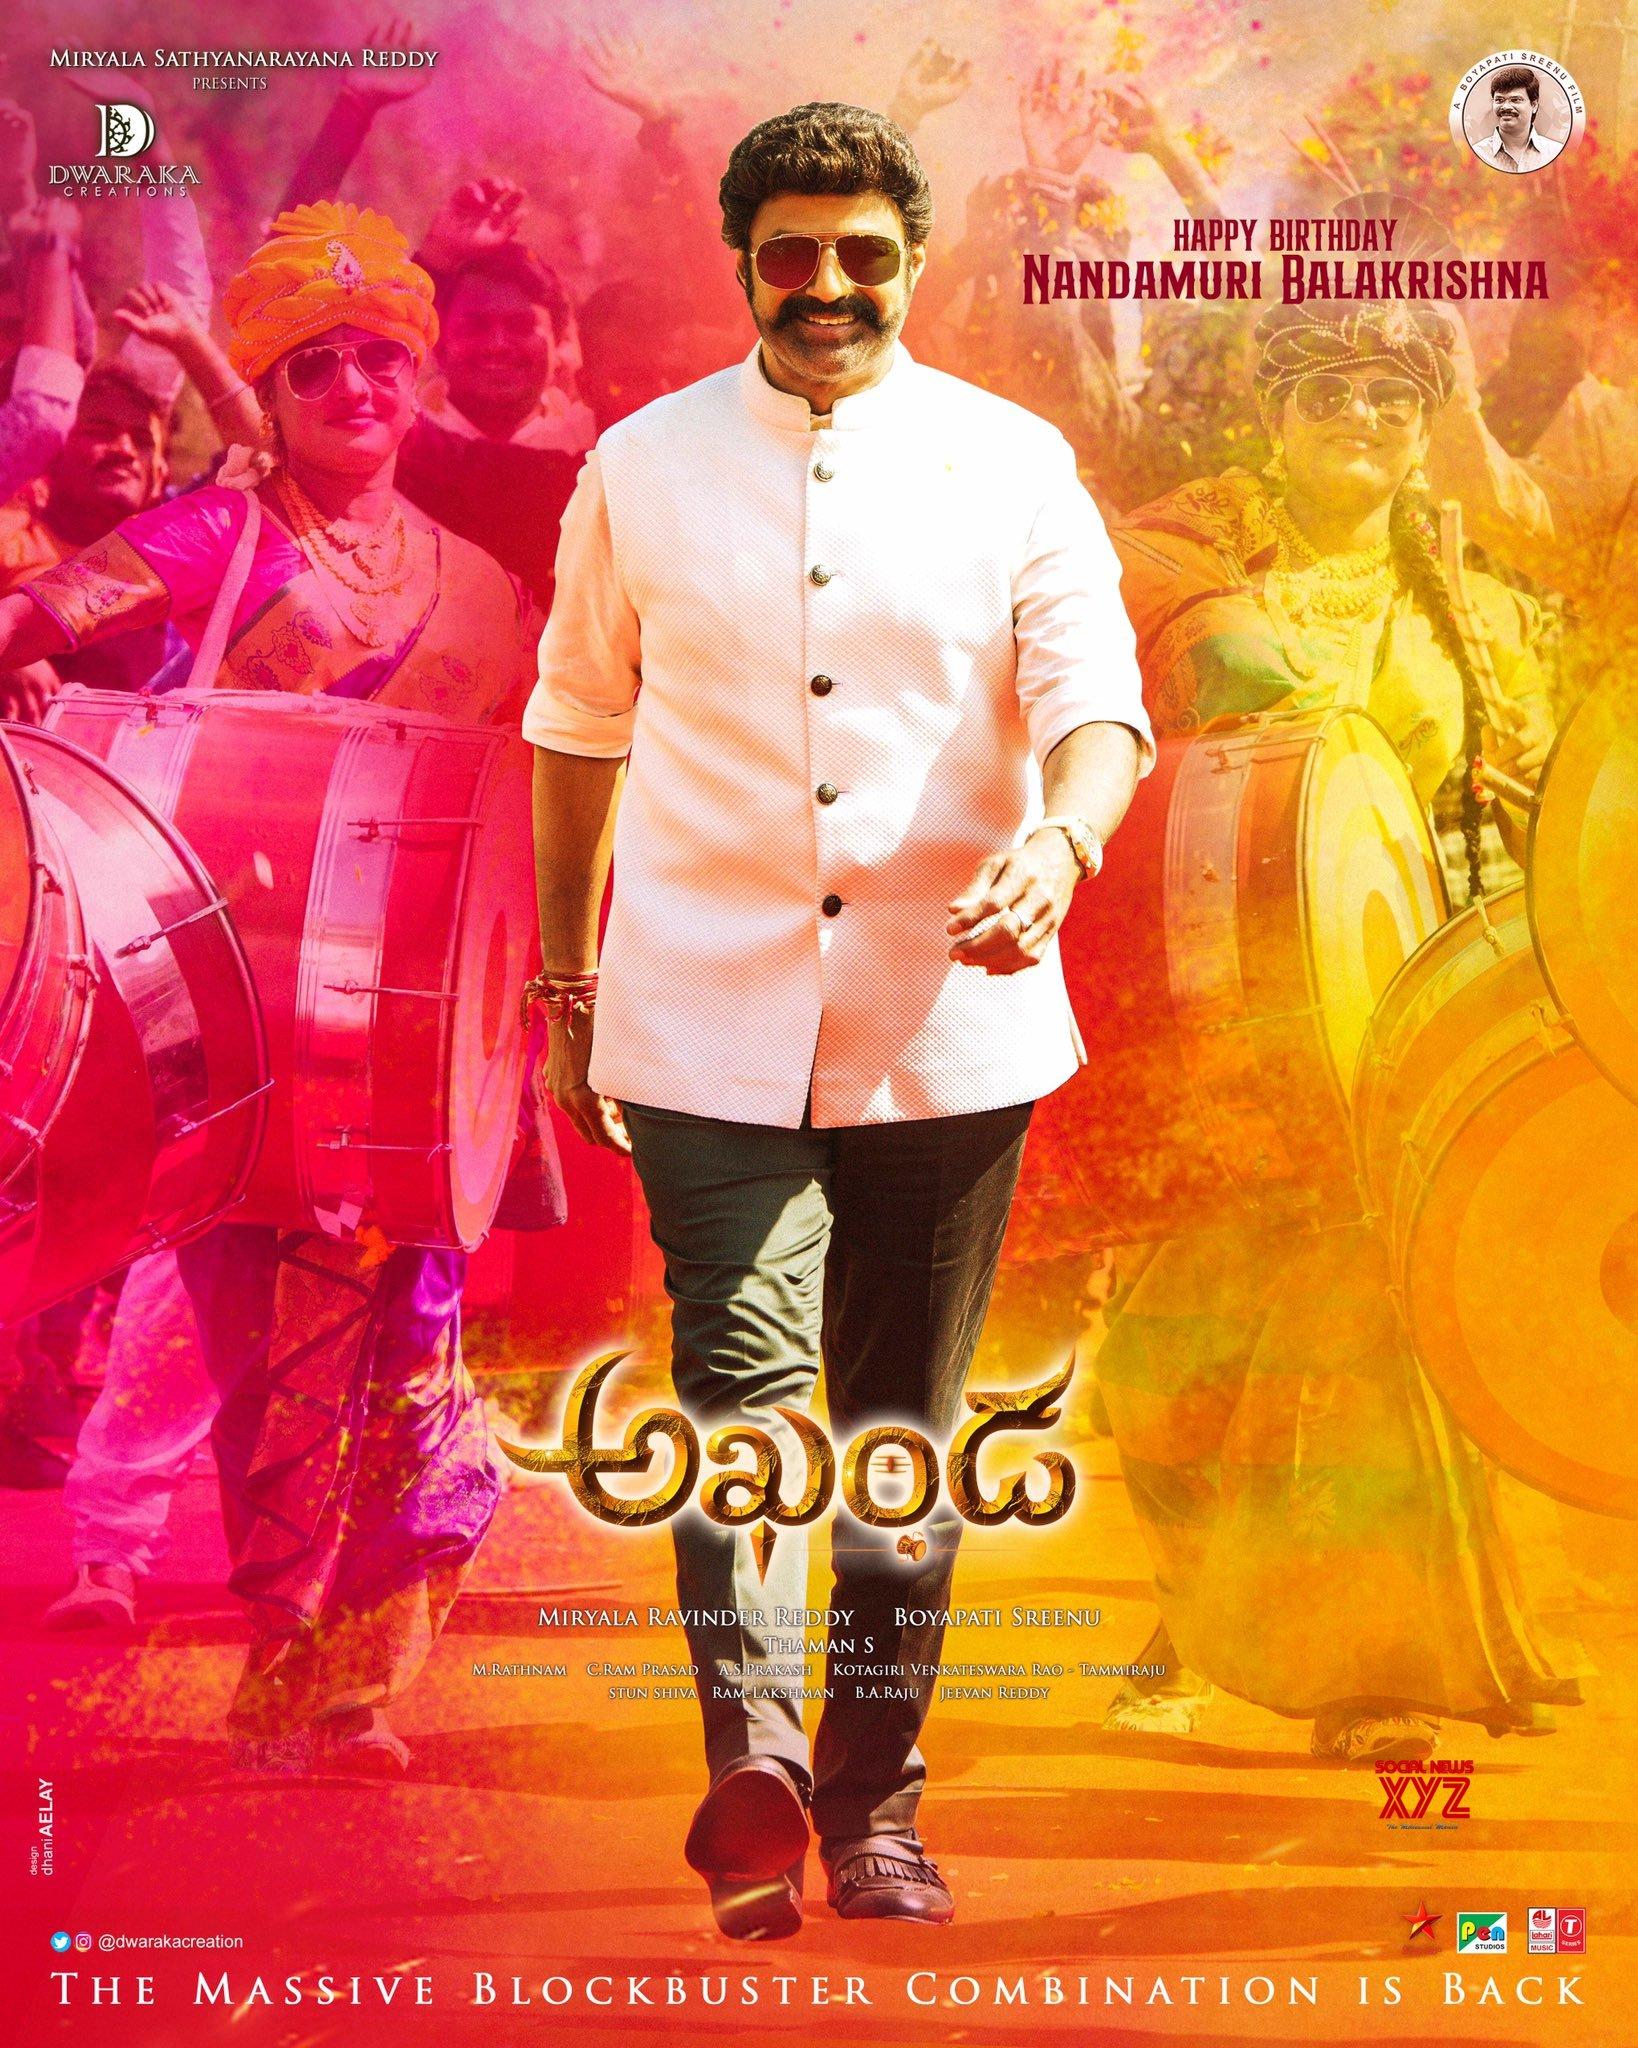 NataSimha Nandamuri Balakrishna Birthday Special Poster And Still From Akhanda Movie Team